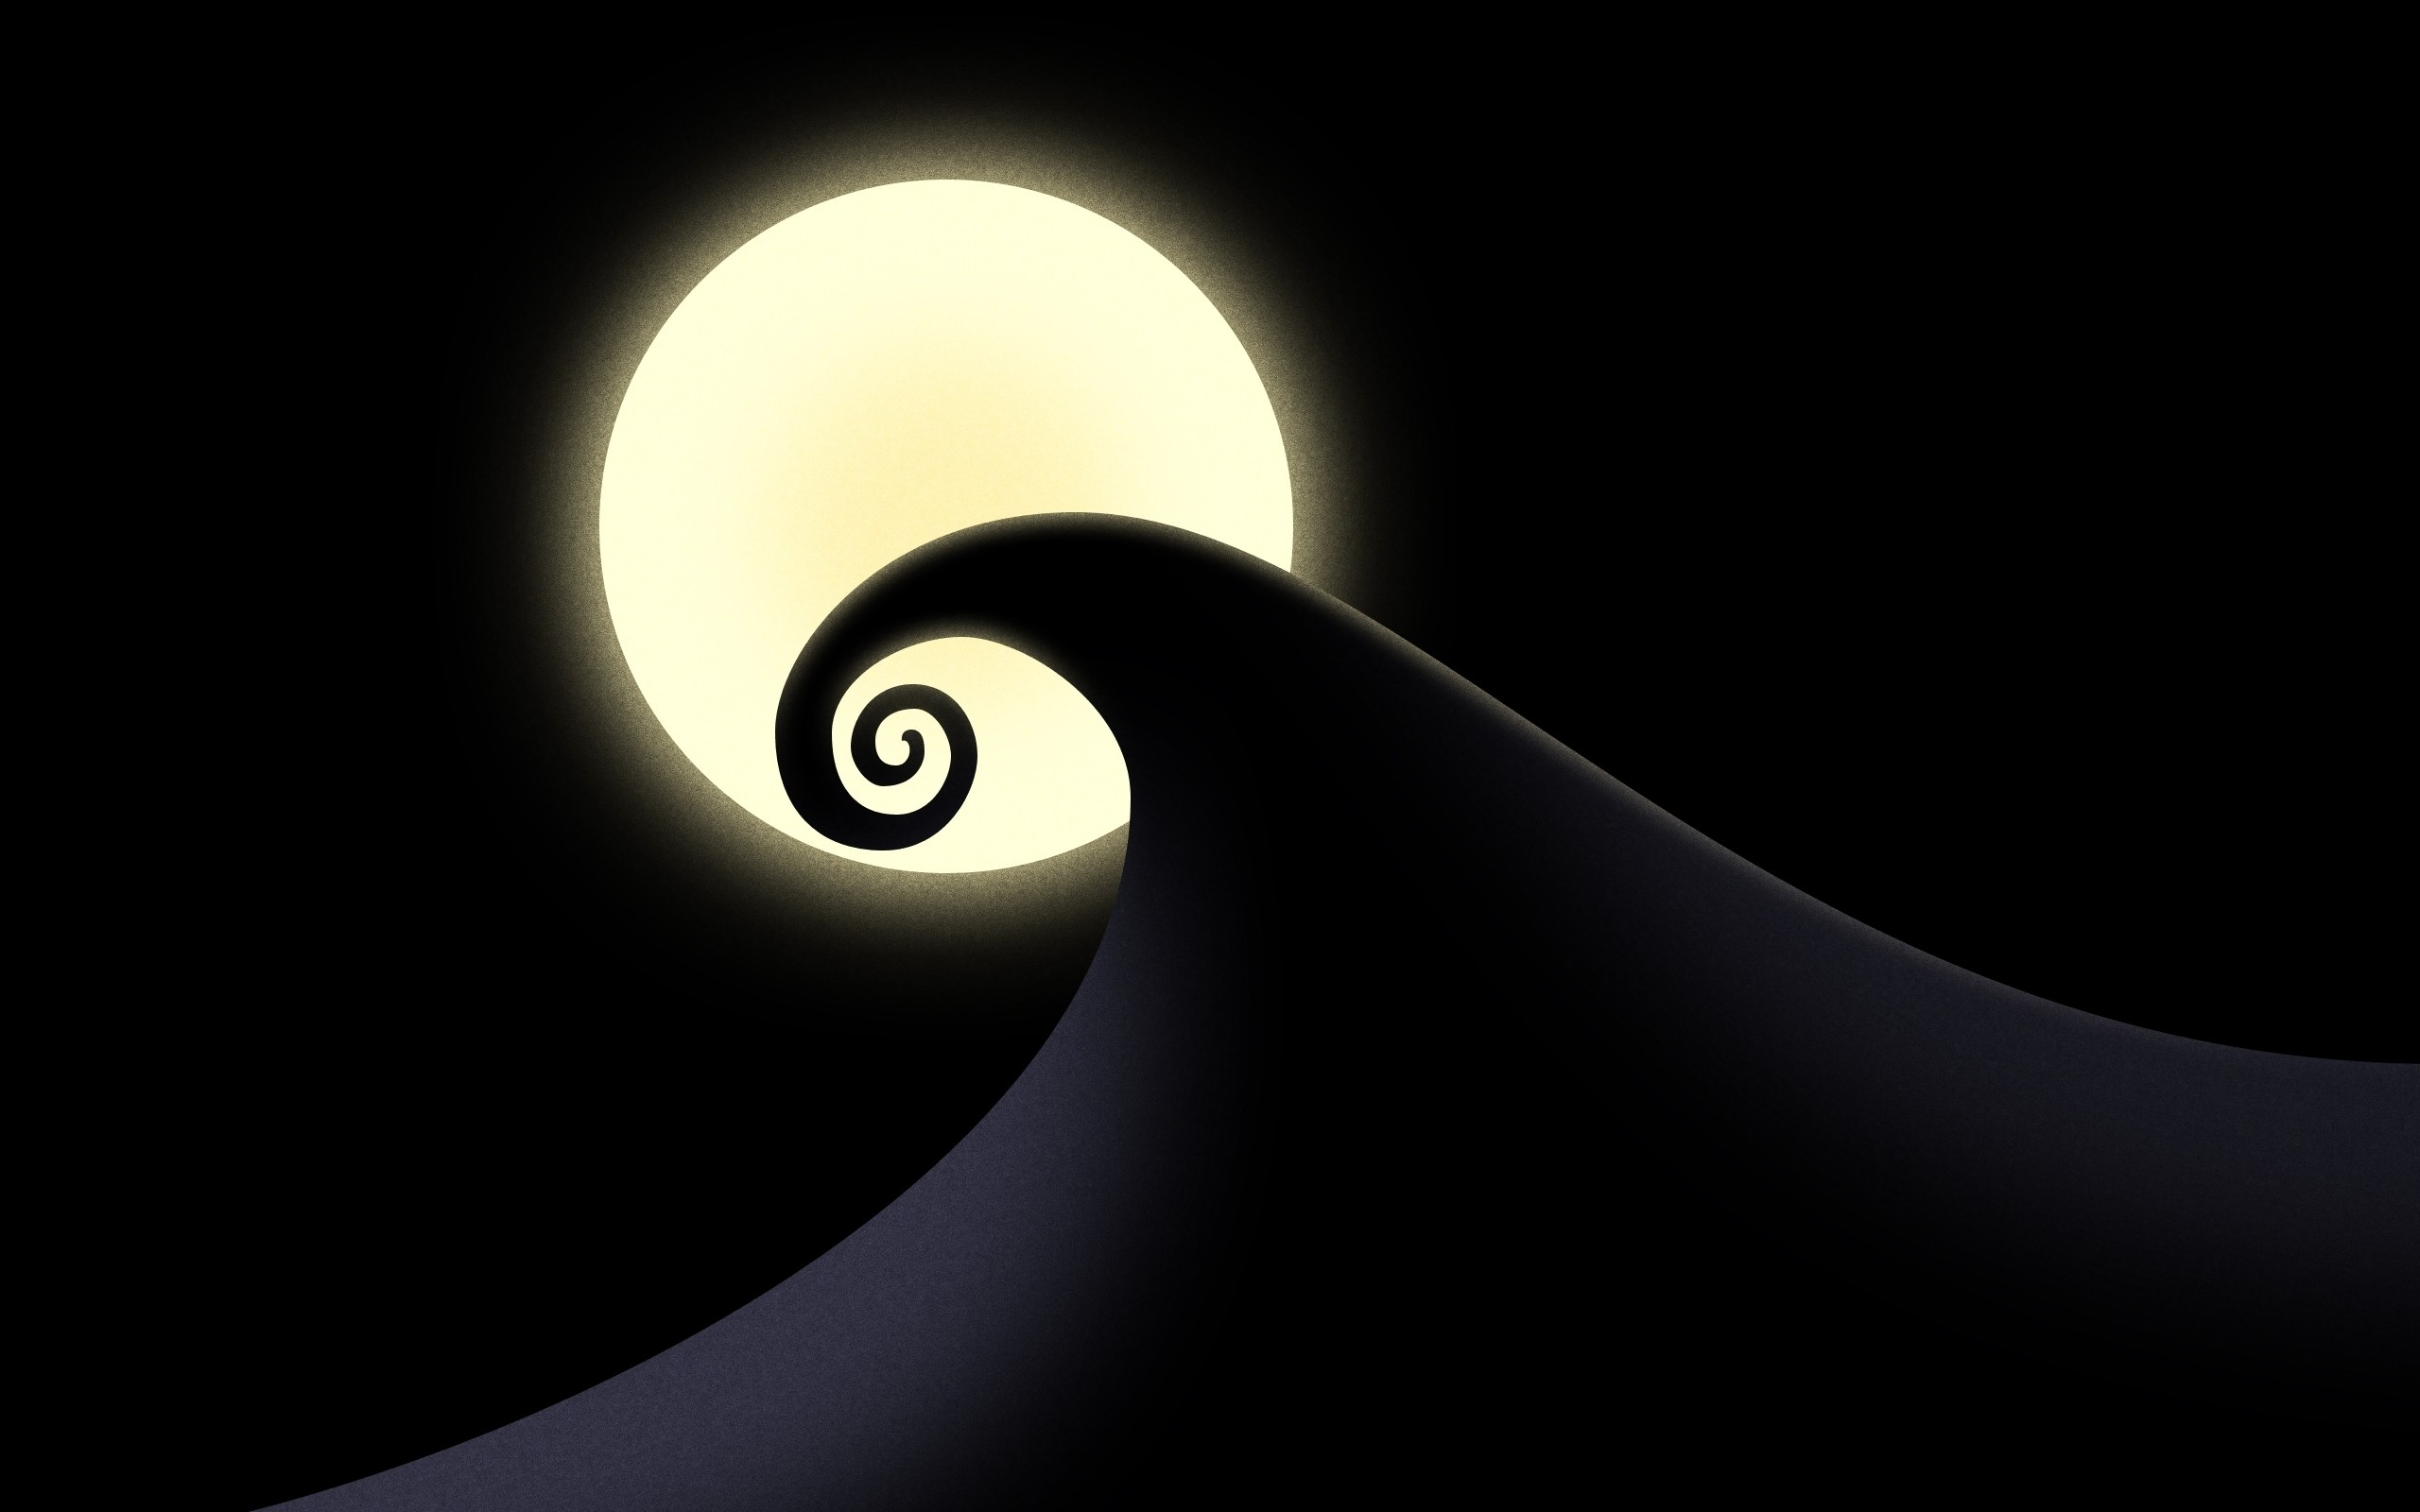 the nightmare before christmas moon swirl halloween background .